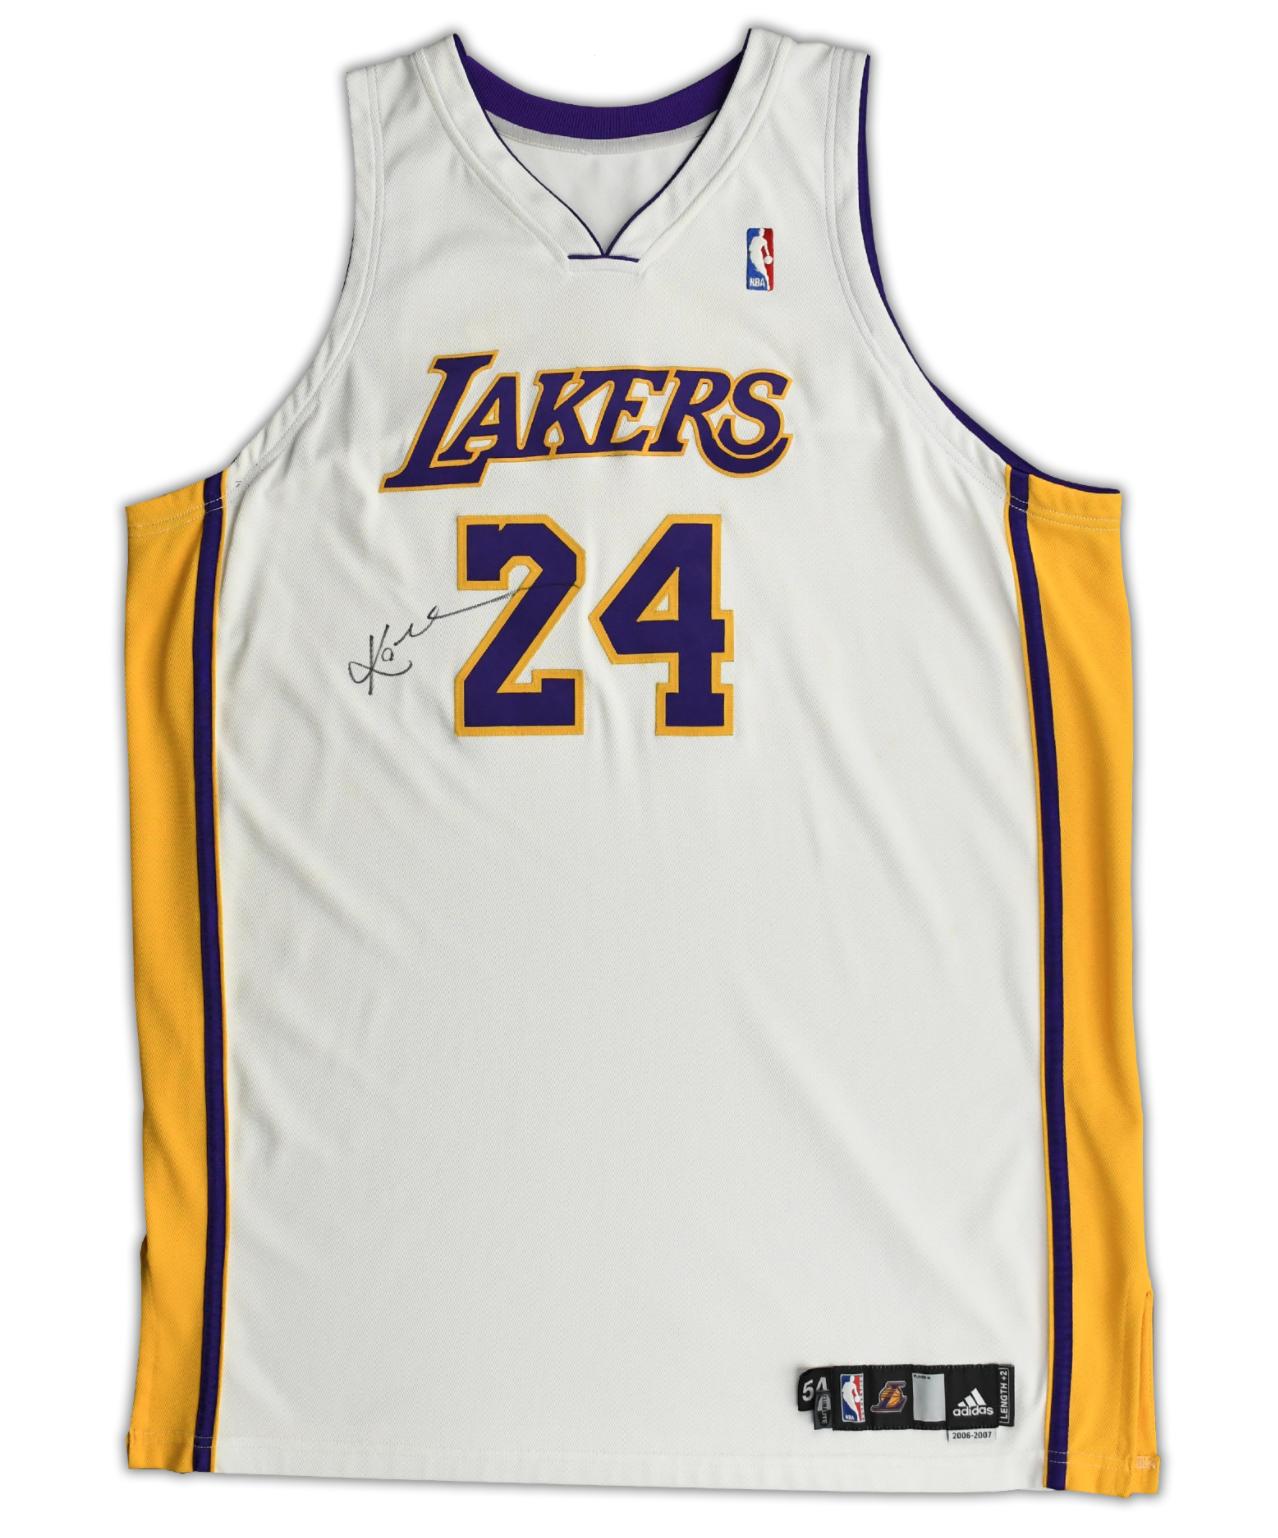 2006-07 Kobe Bryant Debut White #24 Jersey